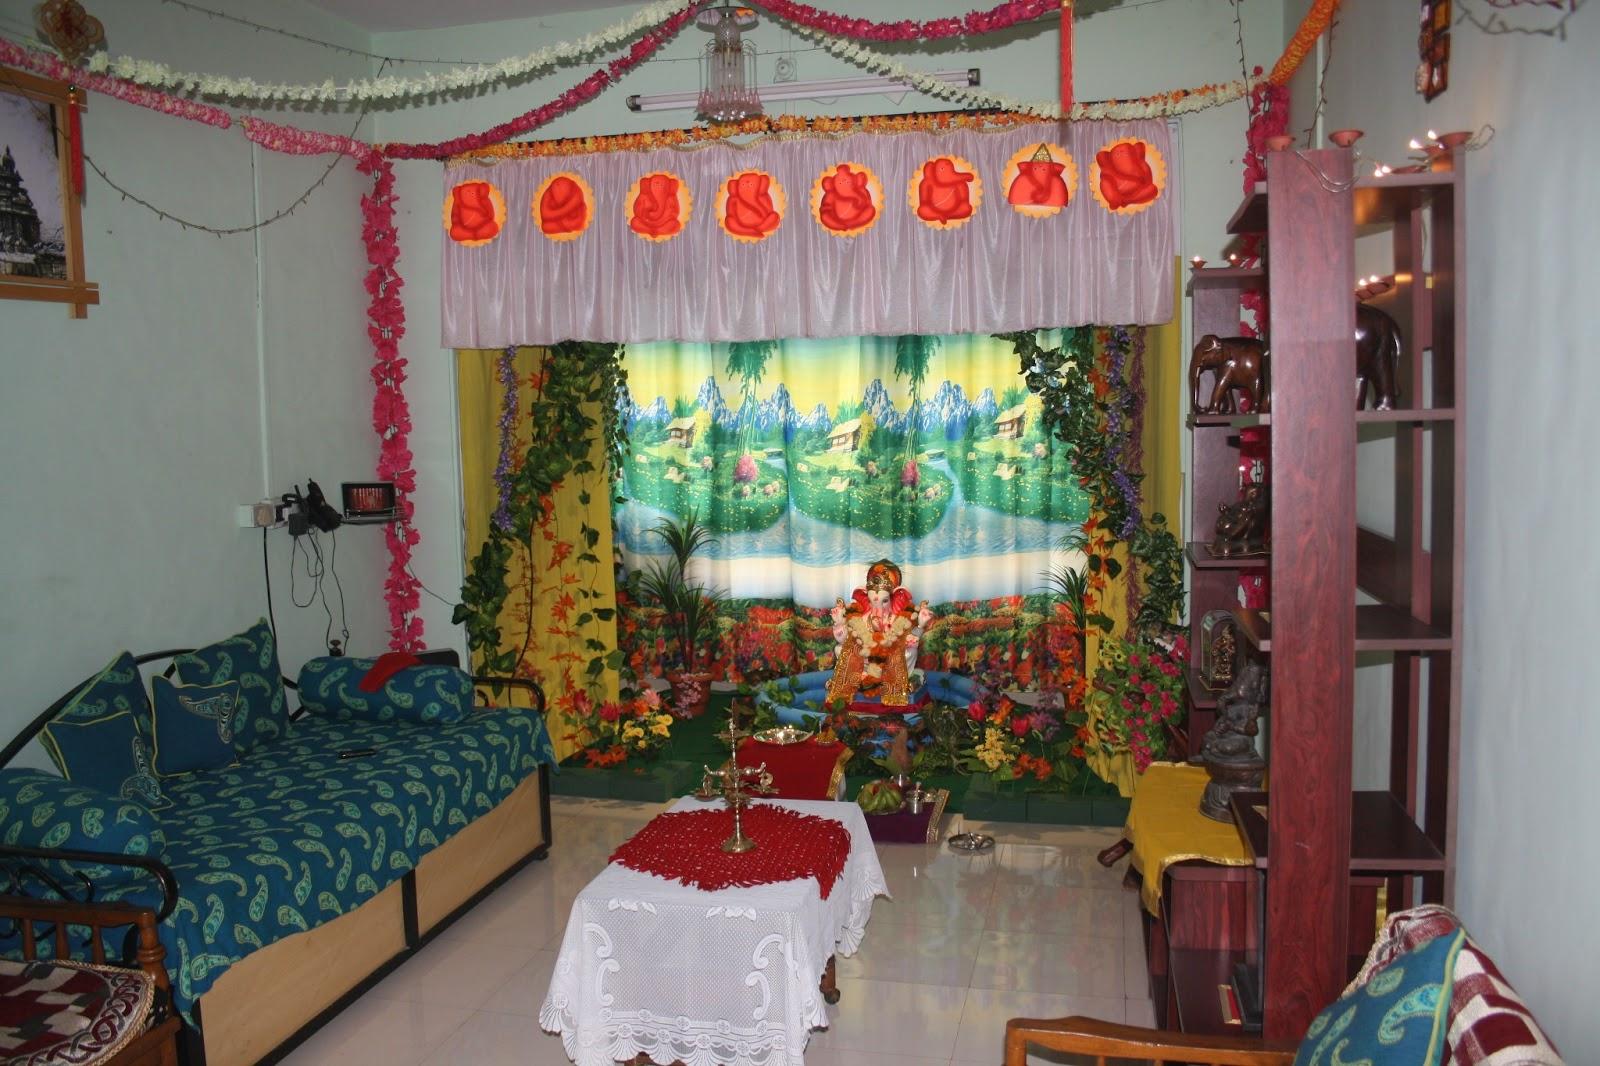 Festival Dhamaal Ganapati Decoration At Home